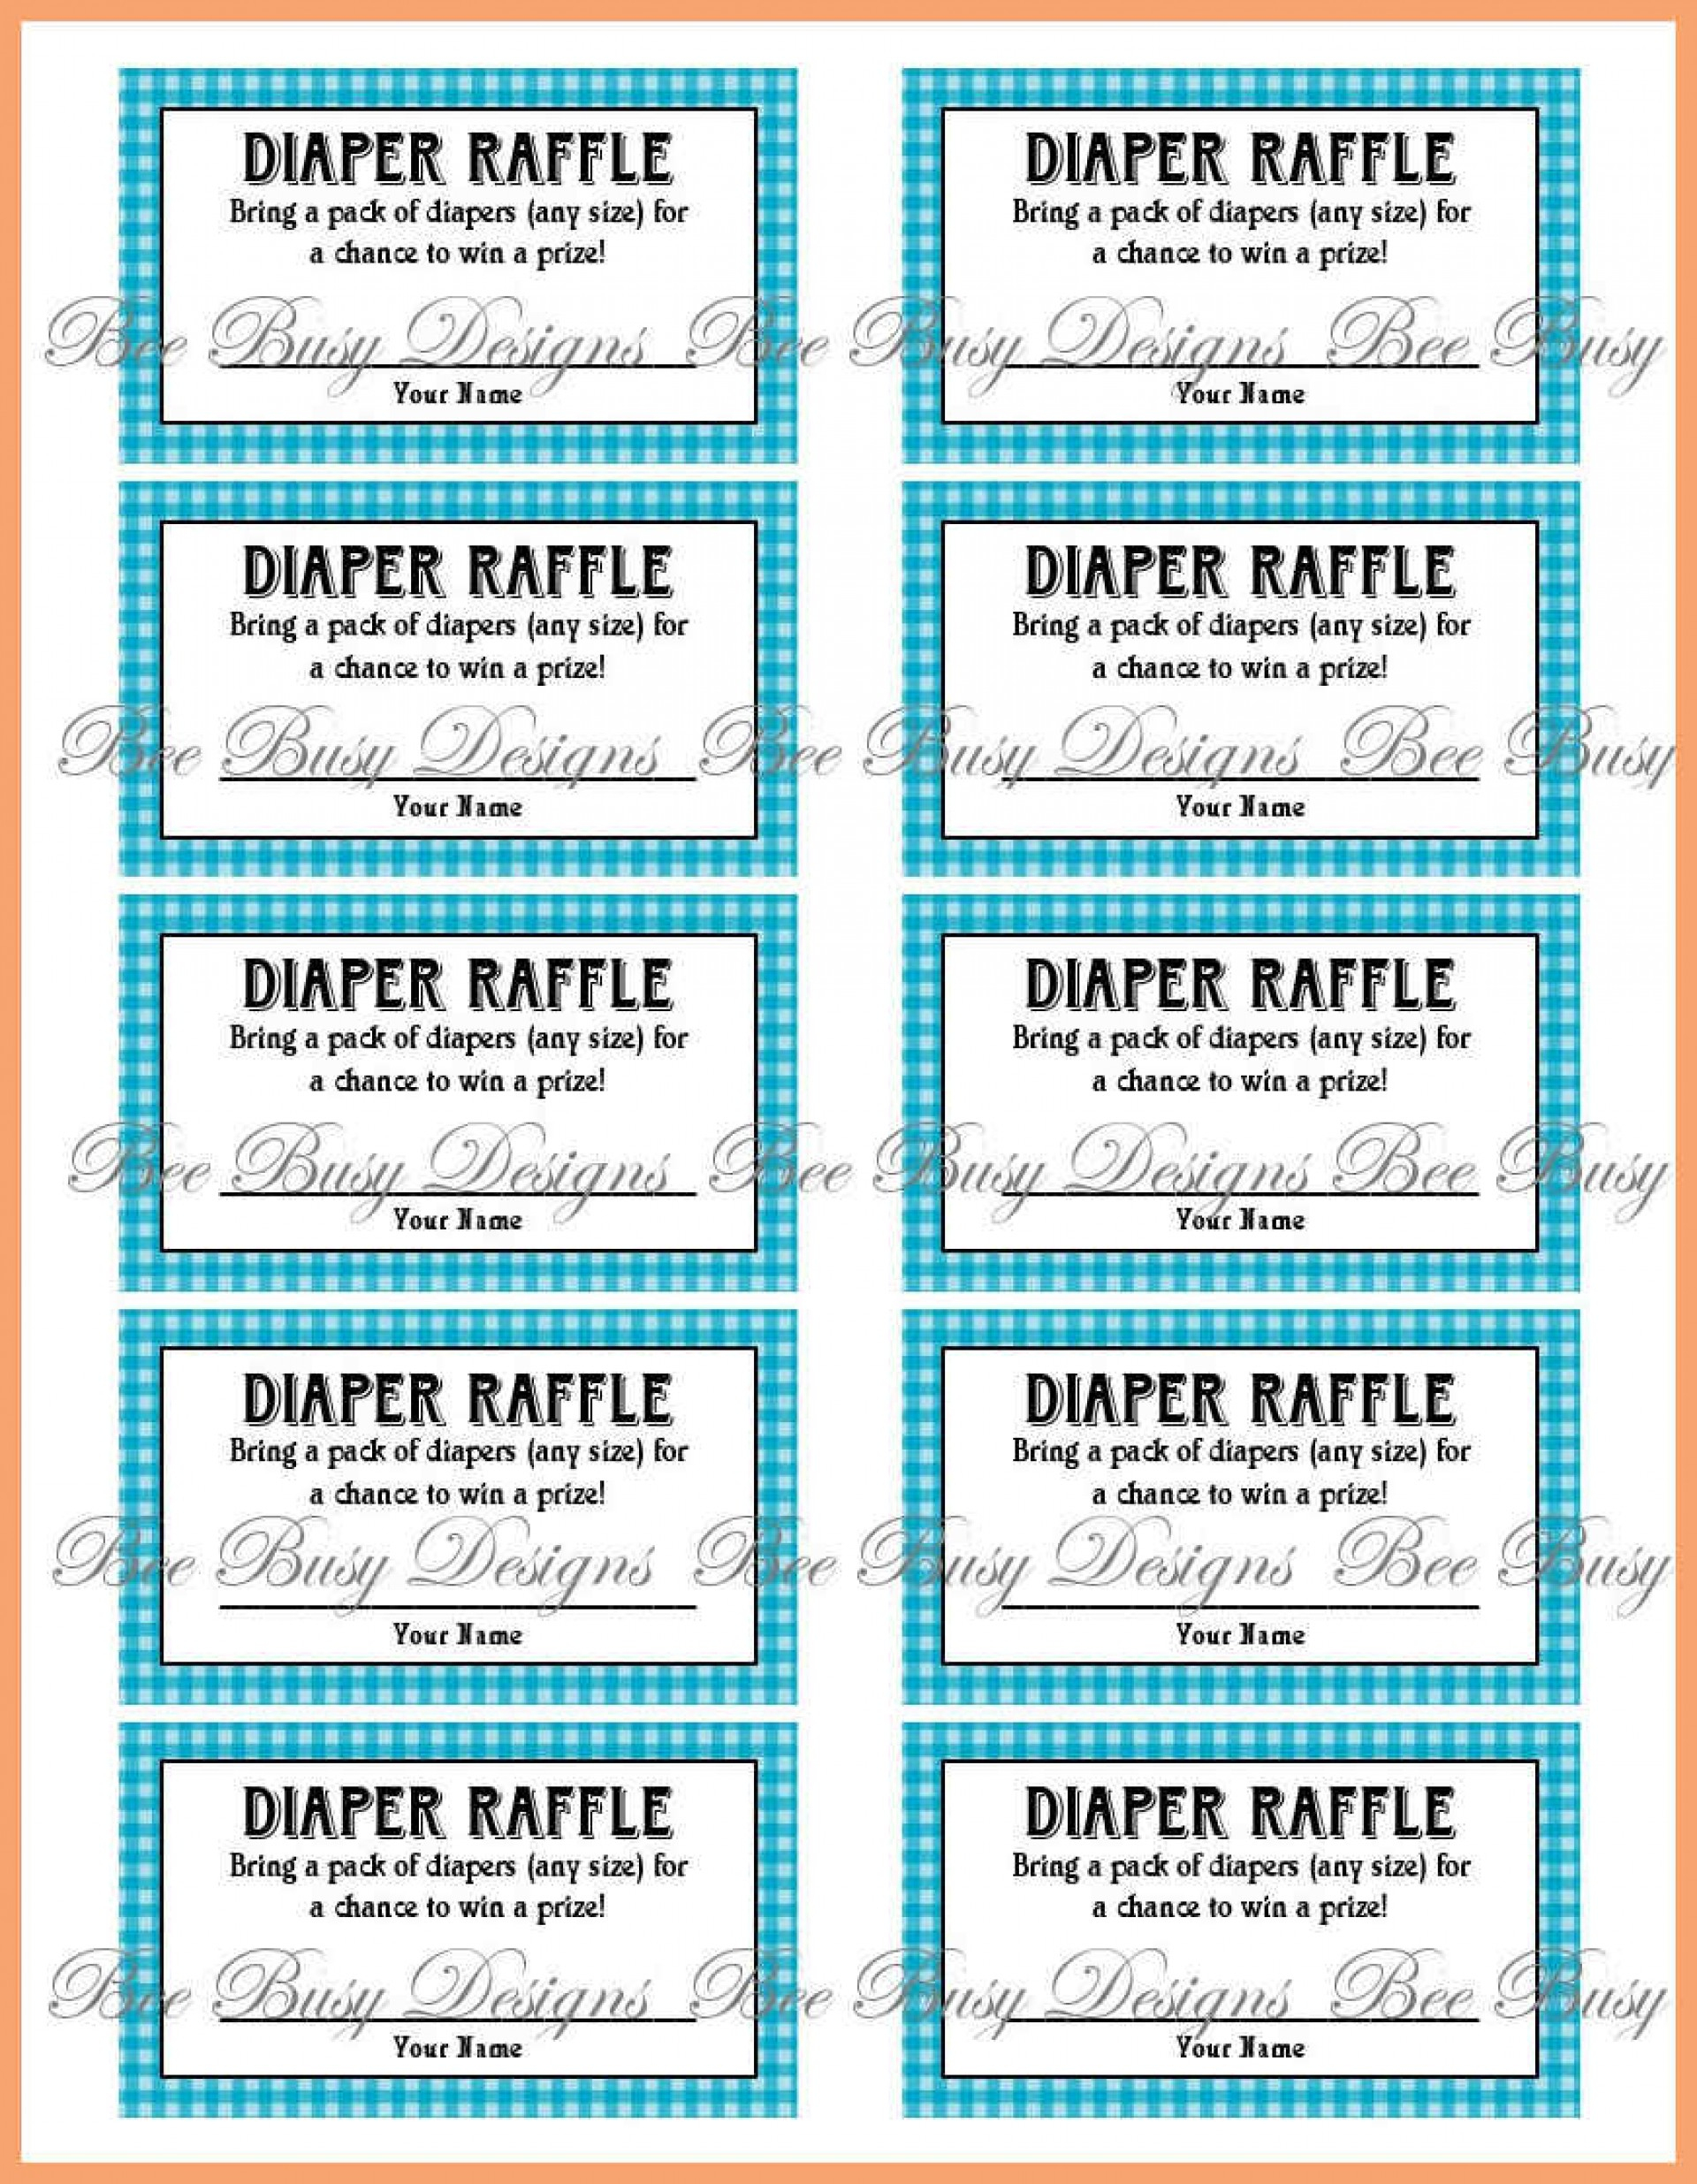 012 Free Printable Ticket Template Elegant For Event Of ~ Ulyssesroom - Diaper Raffle Template Free Printable